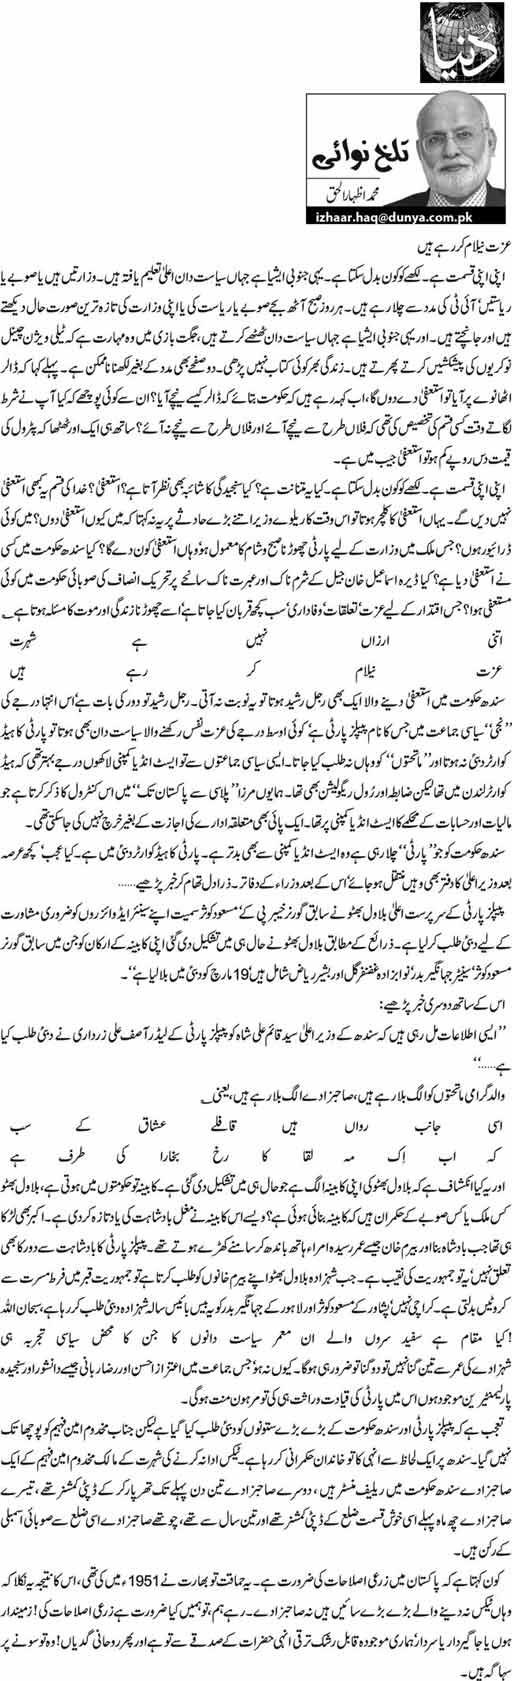 Izzat Neelaam Kar Rahe Hain - Muhammad Izhar ul Haq - 13th March 2014